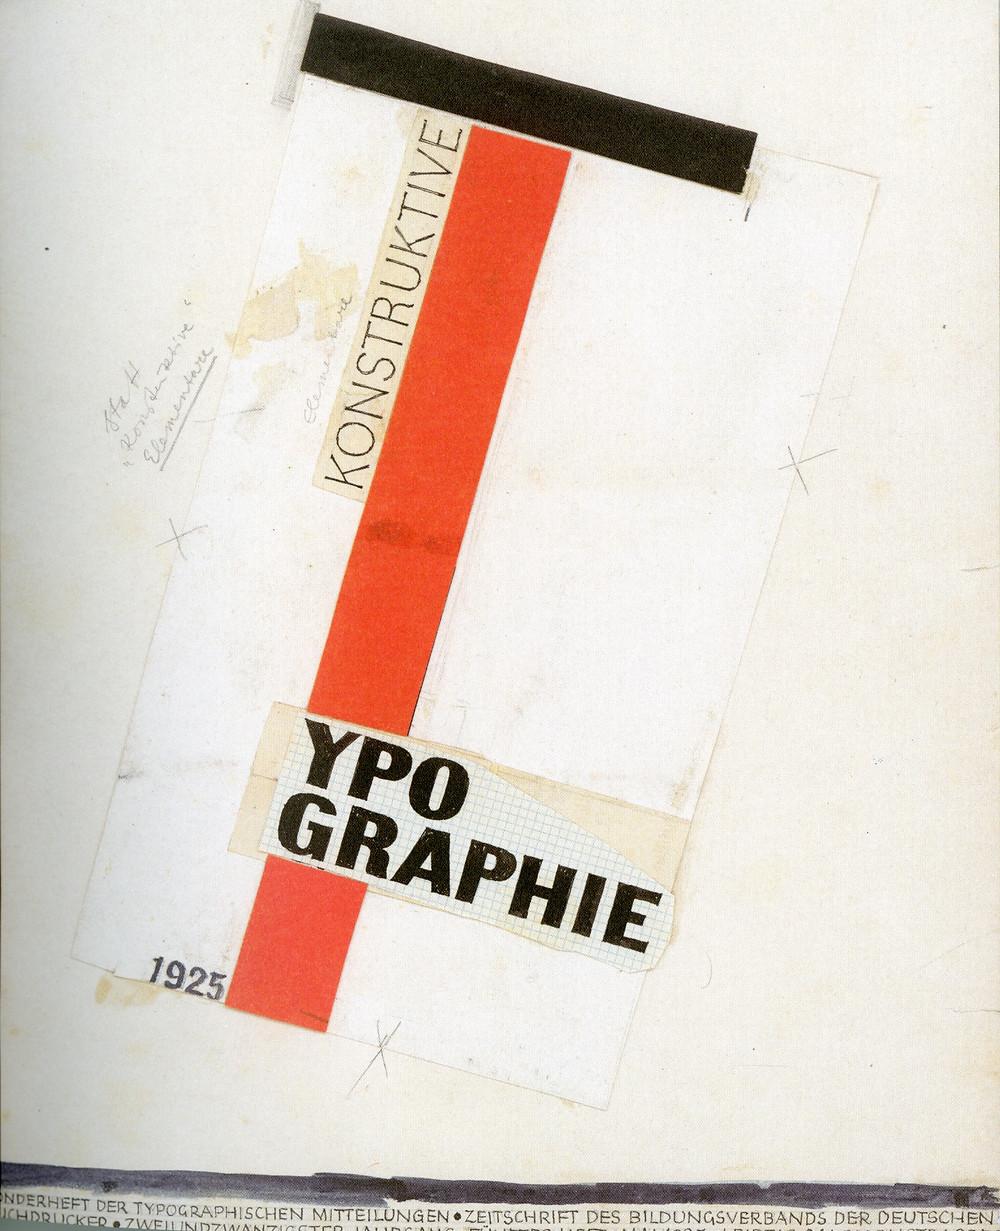 Typographer Jan Tschichold